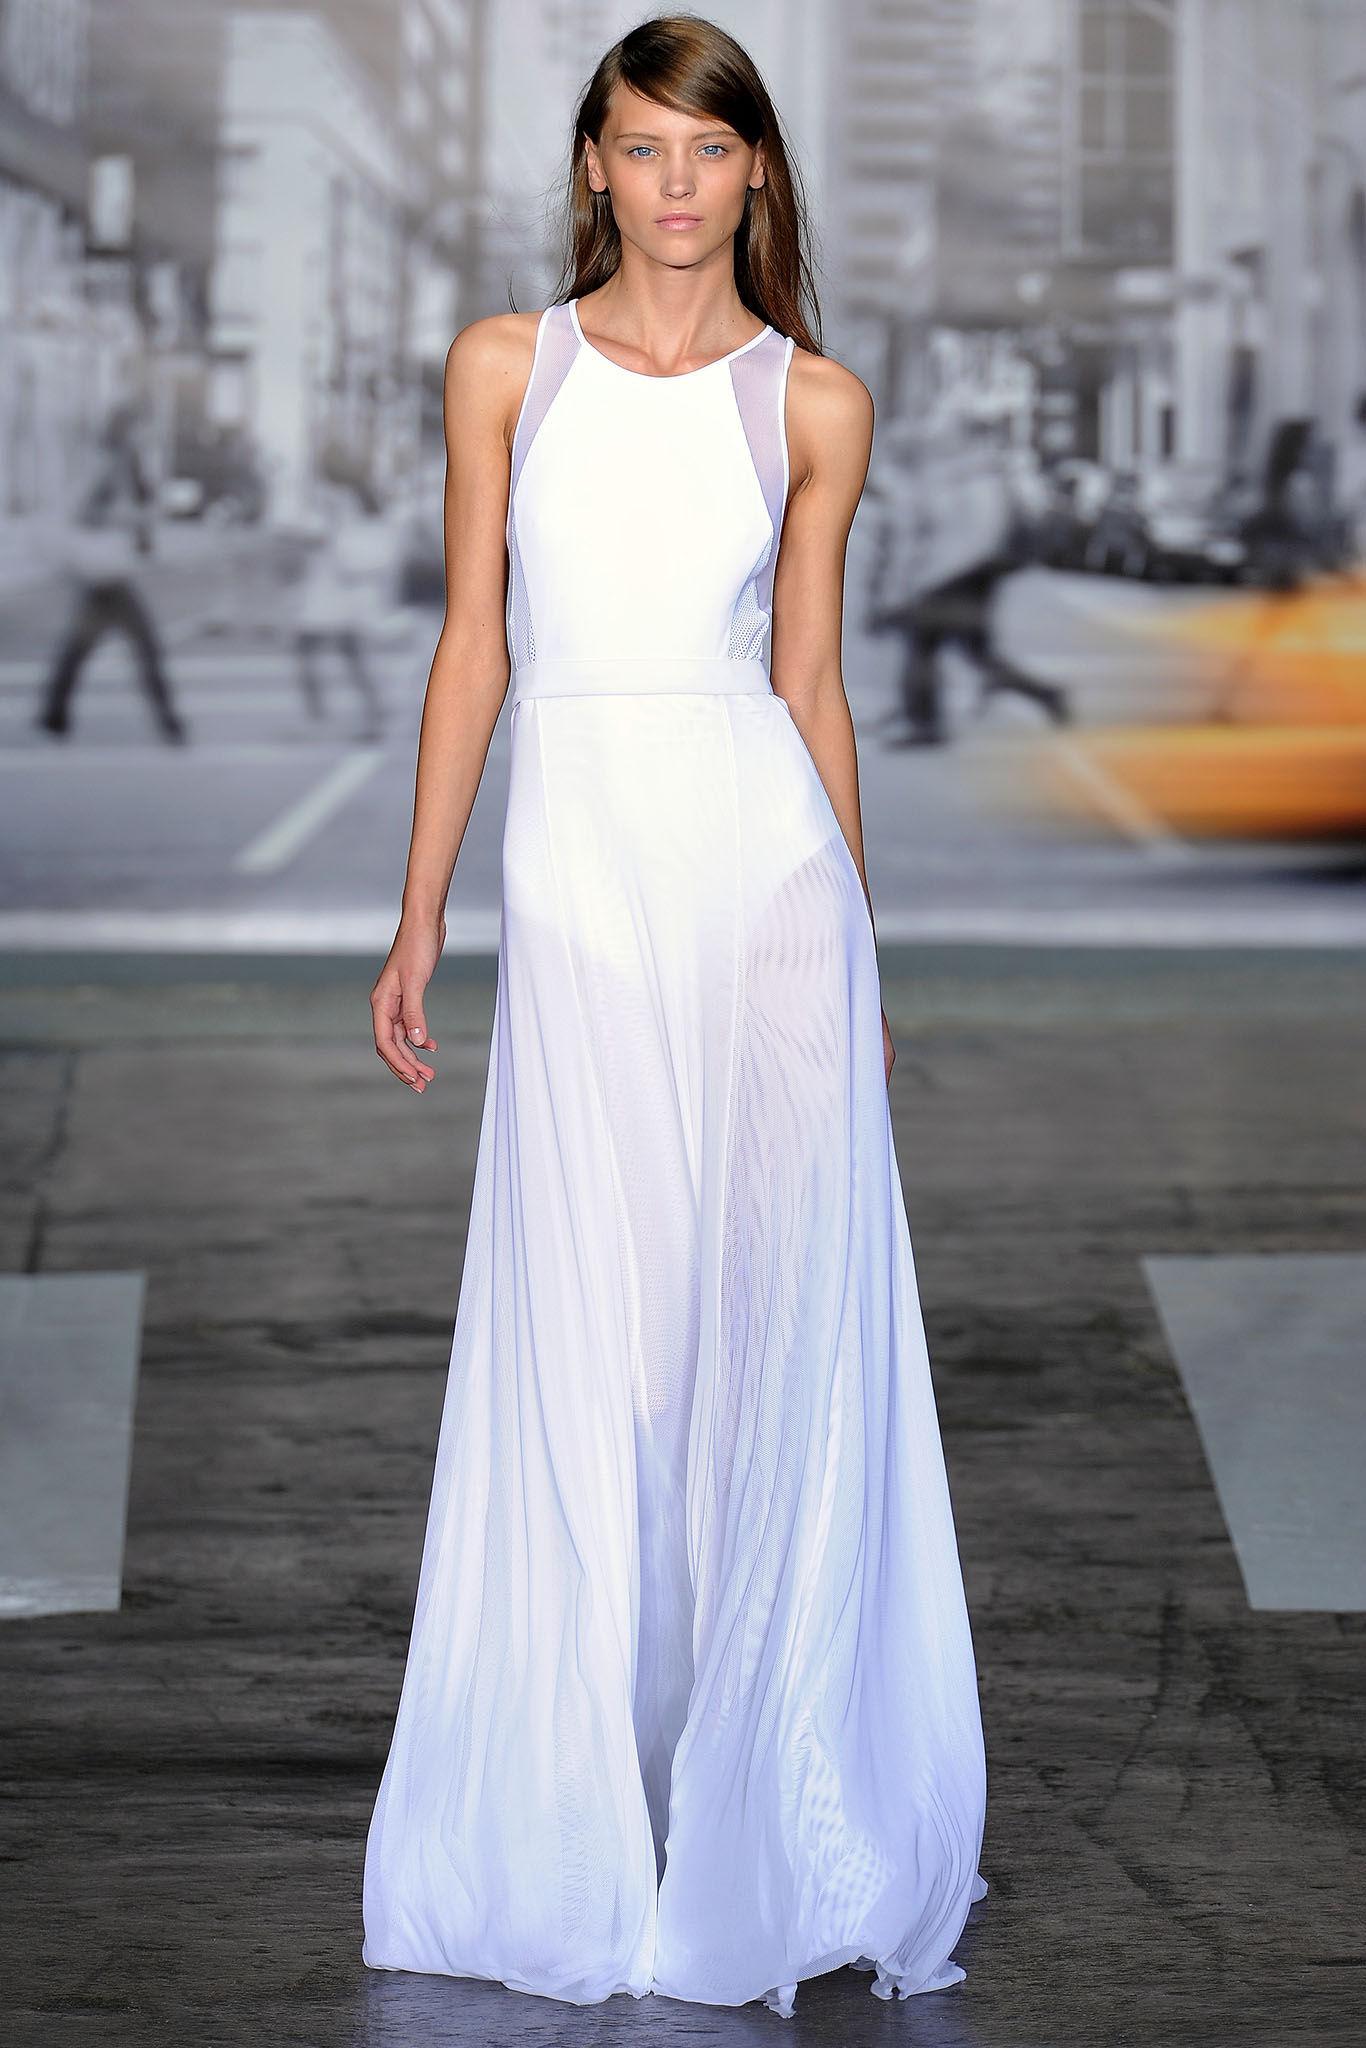 486253bb83 DKNY Spring 2013 maxi dress.